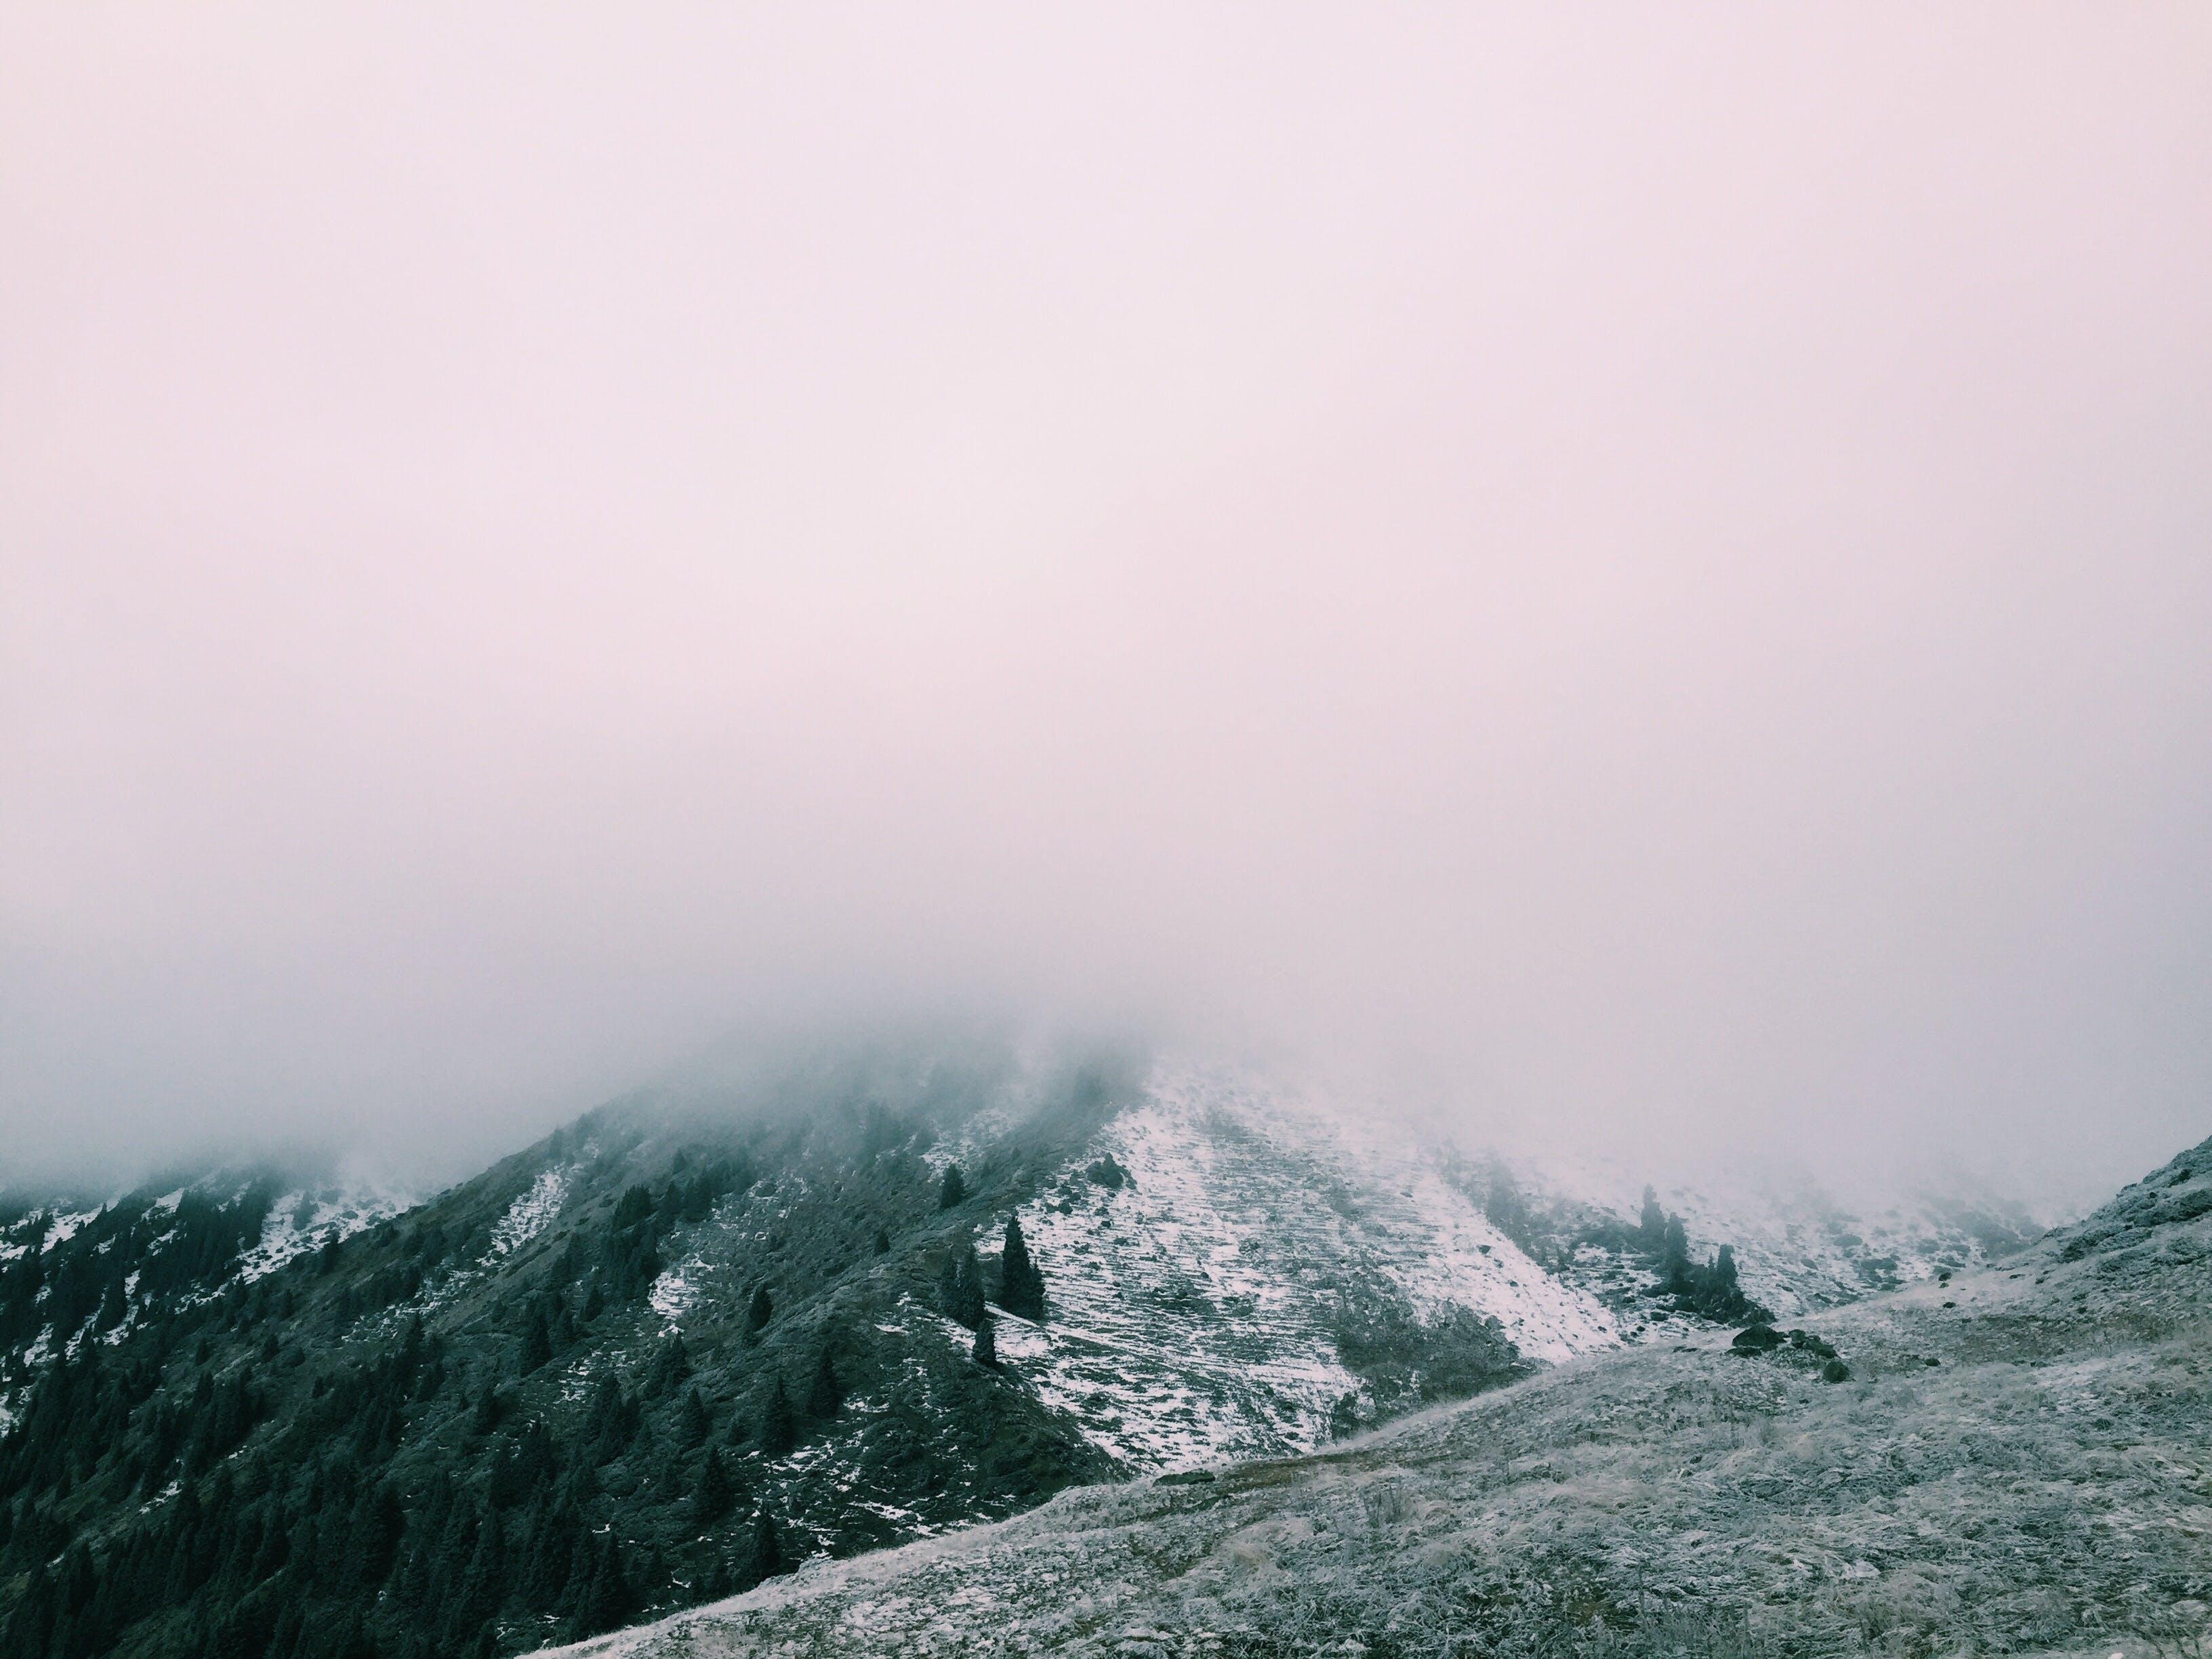 Free stock photo of mountains, nature, fog